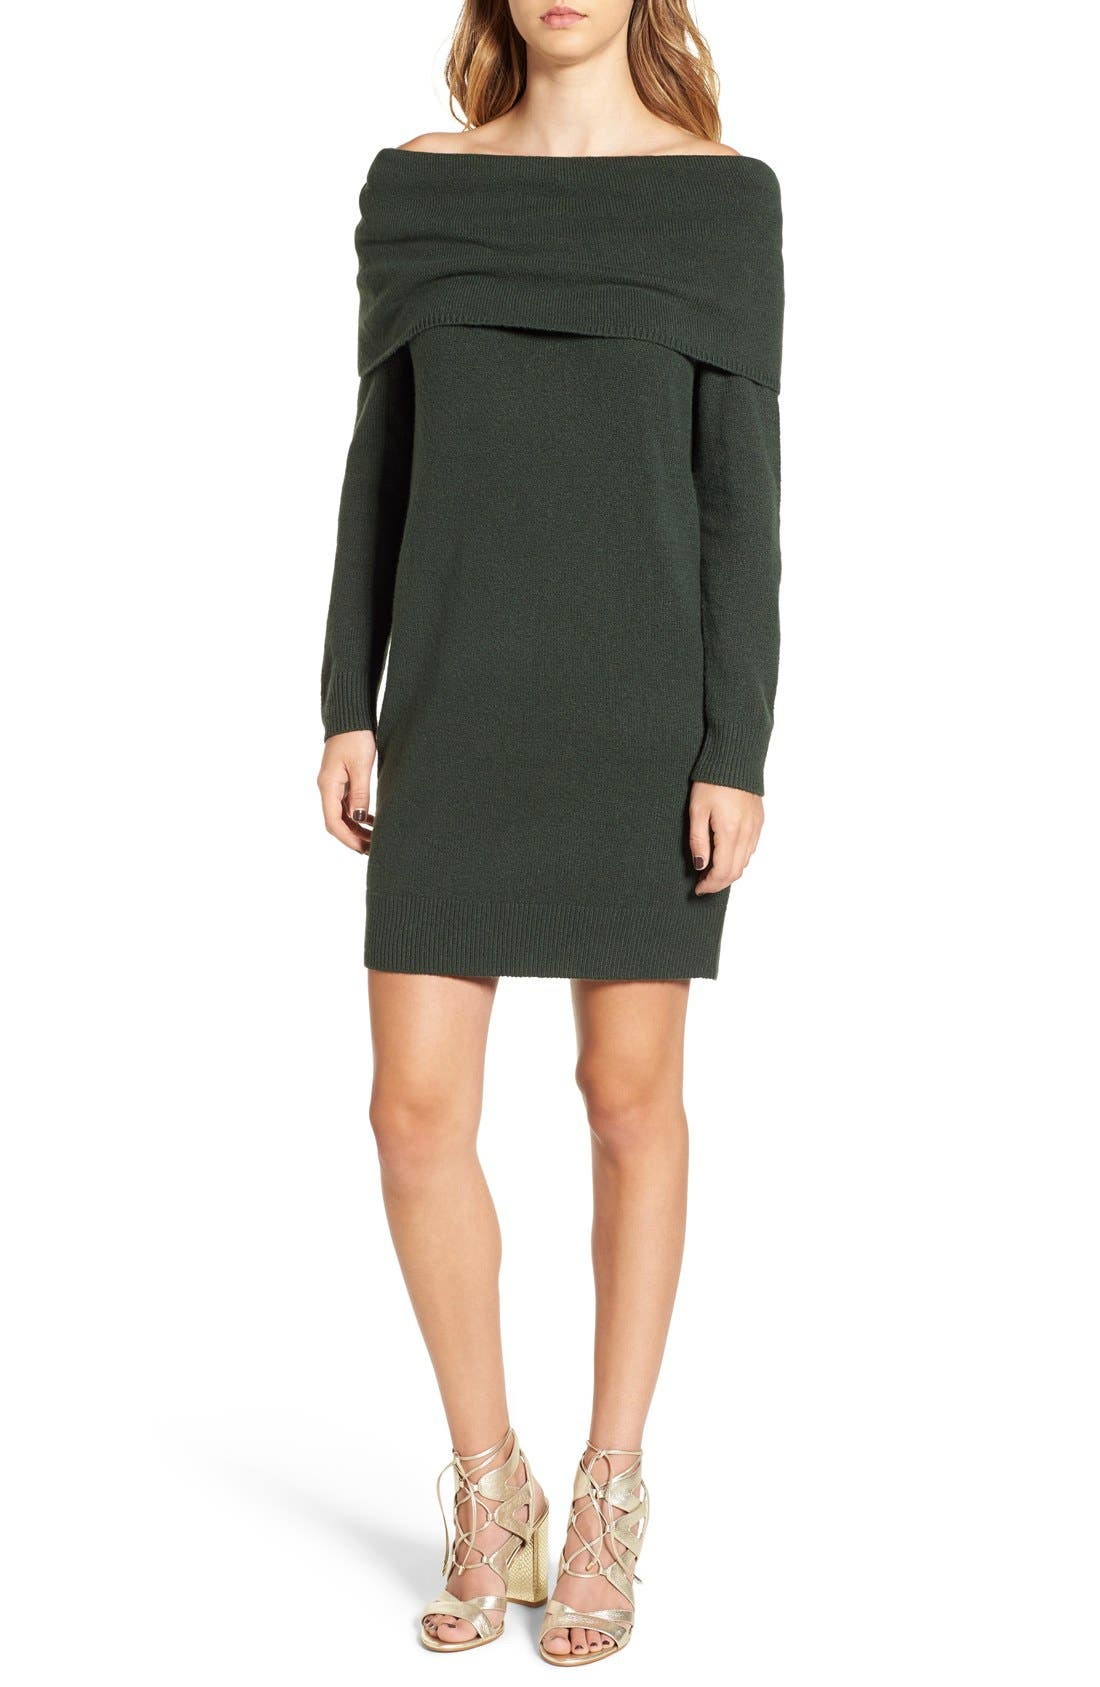 Alternate Image 1 Selected - BP. Off the Shoulder Sweater Dress